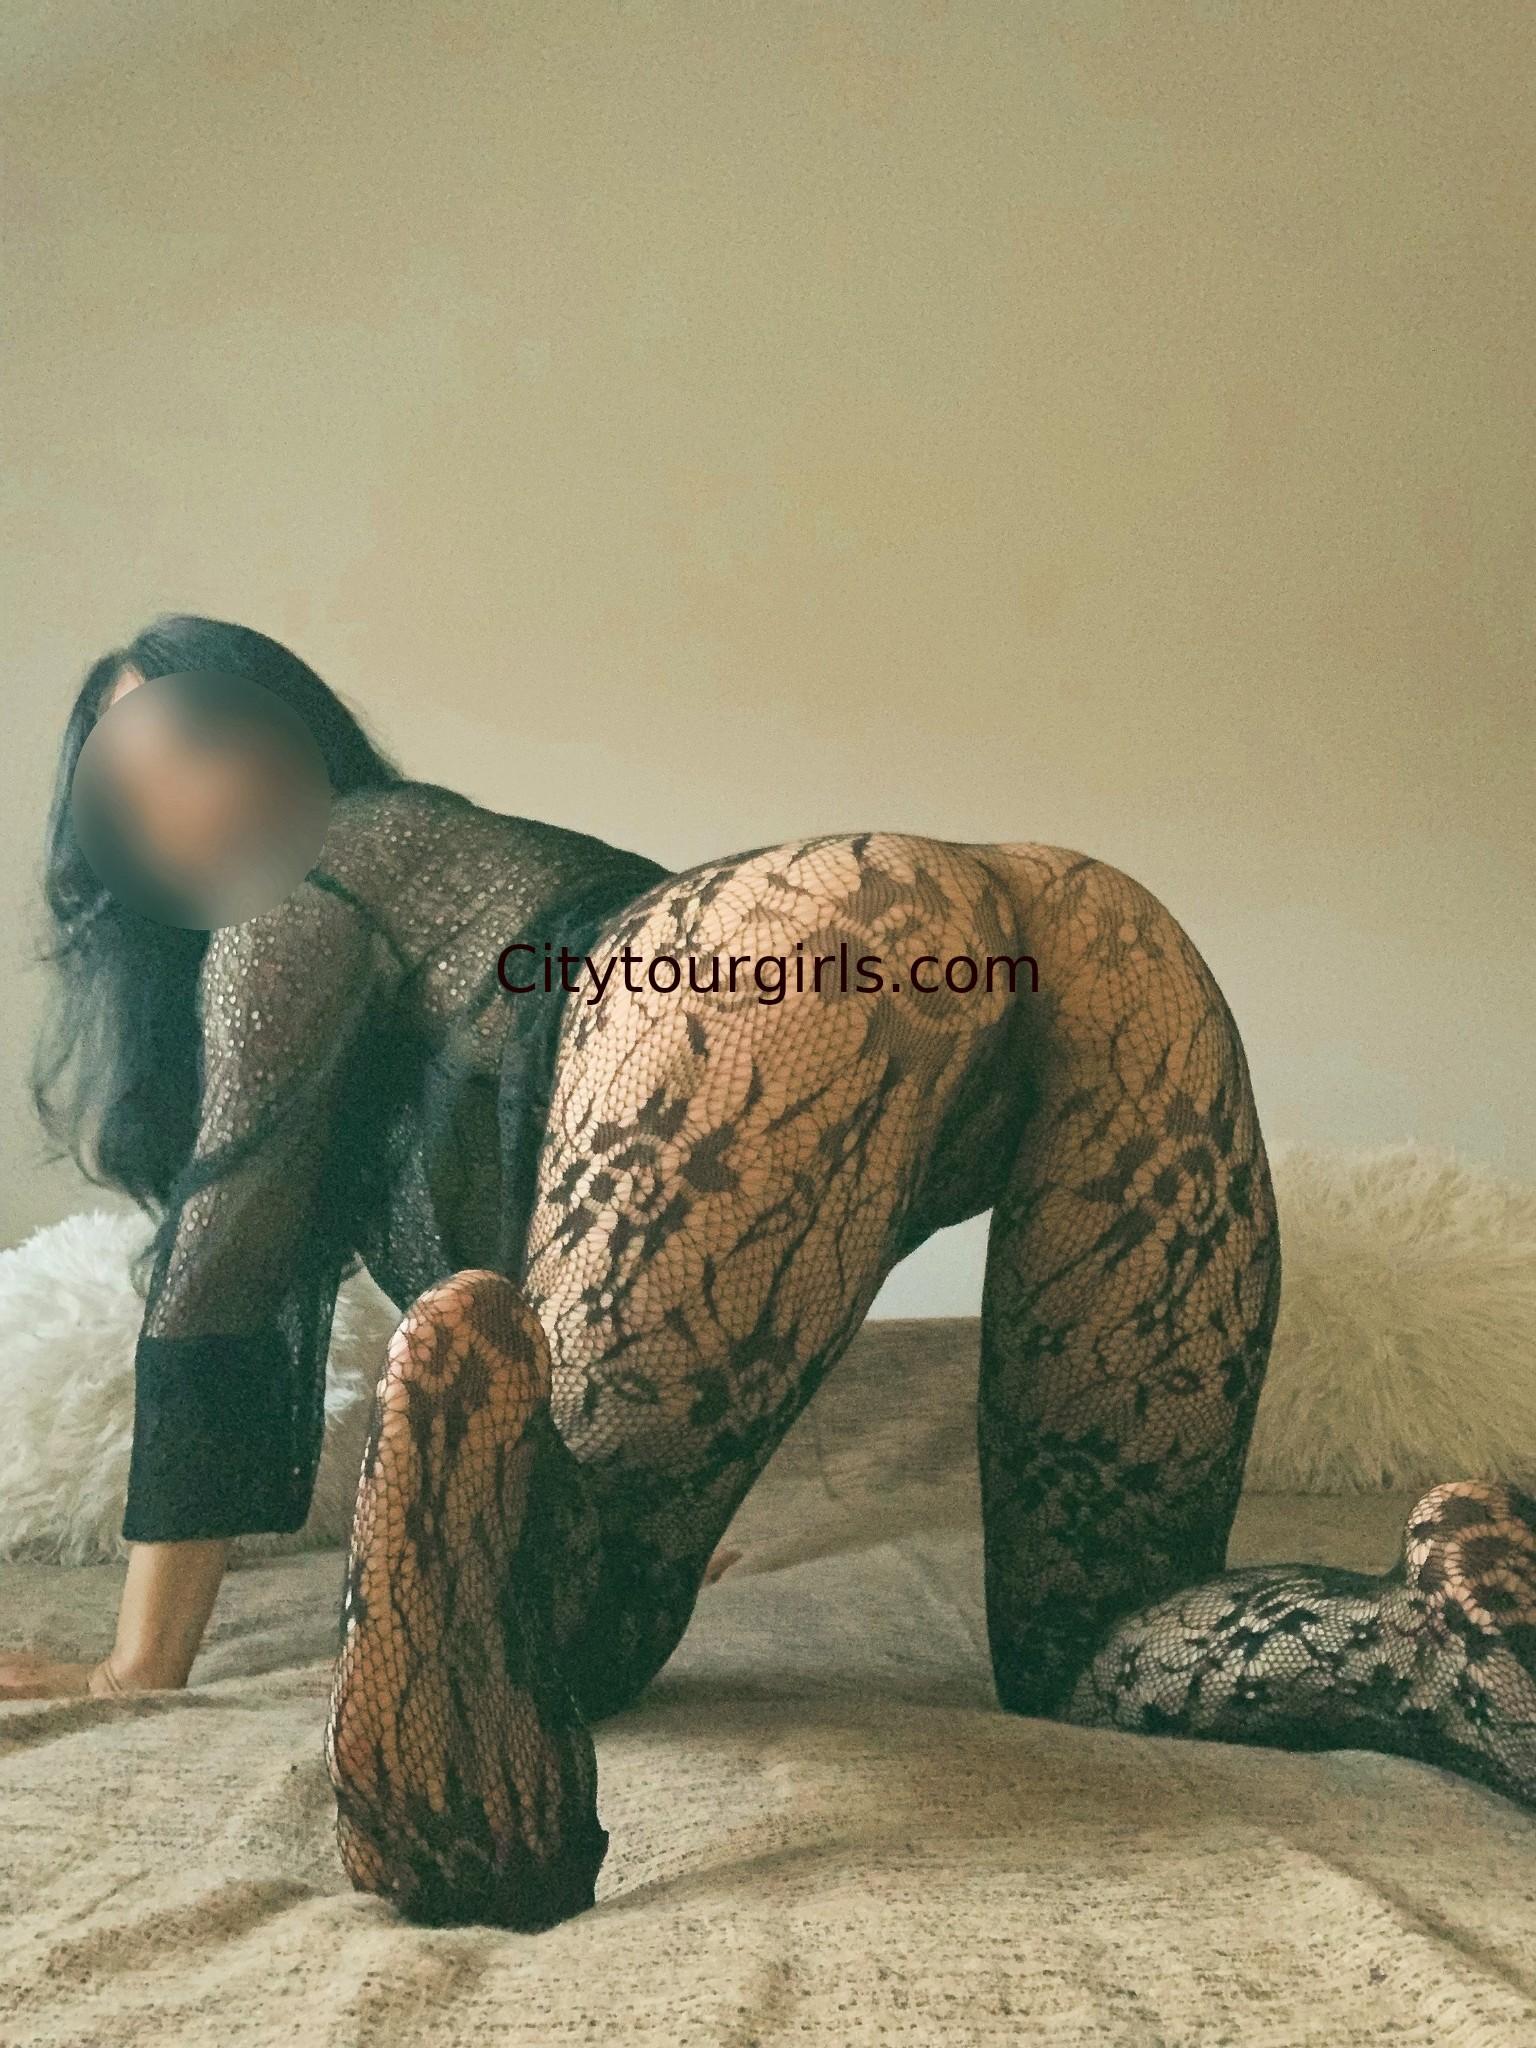 Beverly lynne pornstar nude